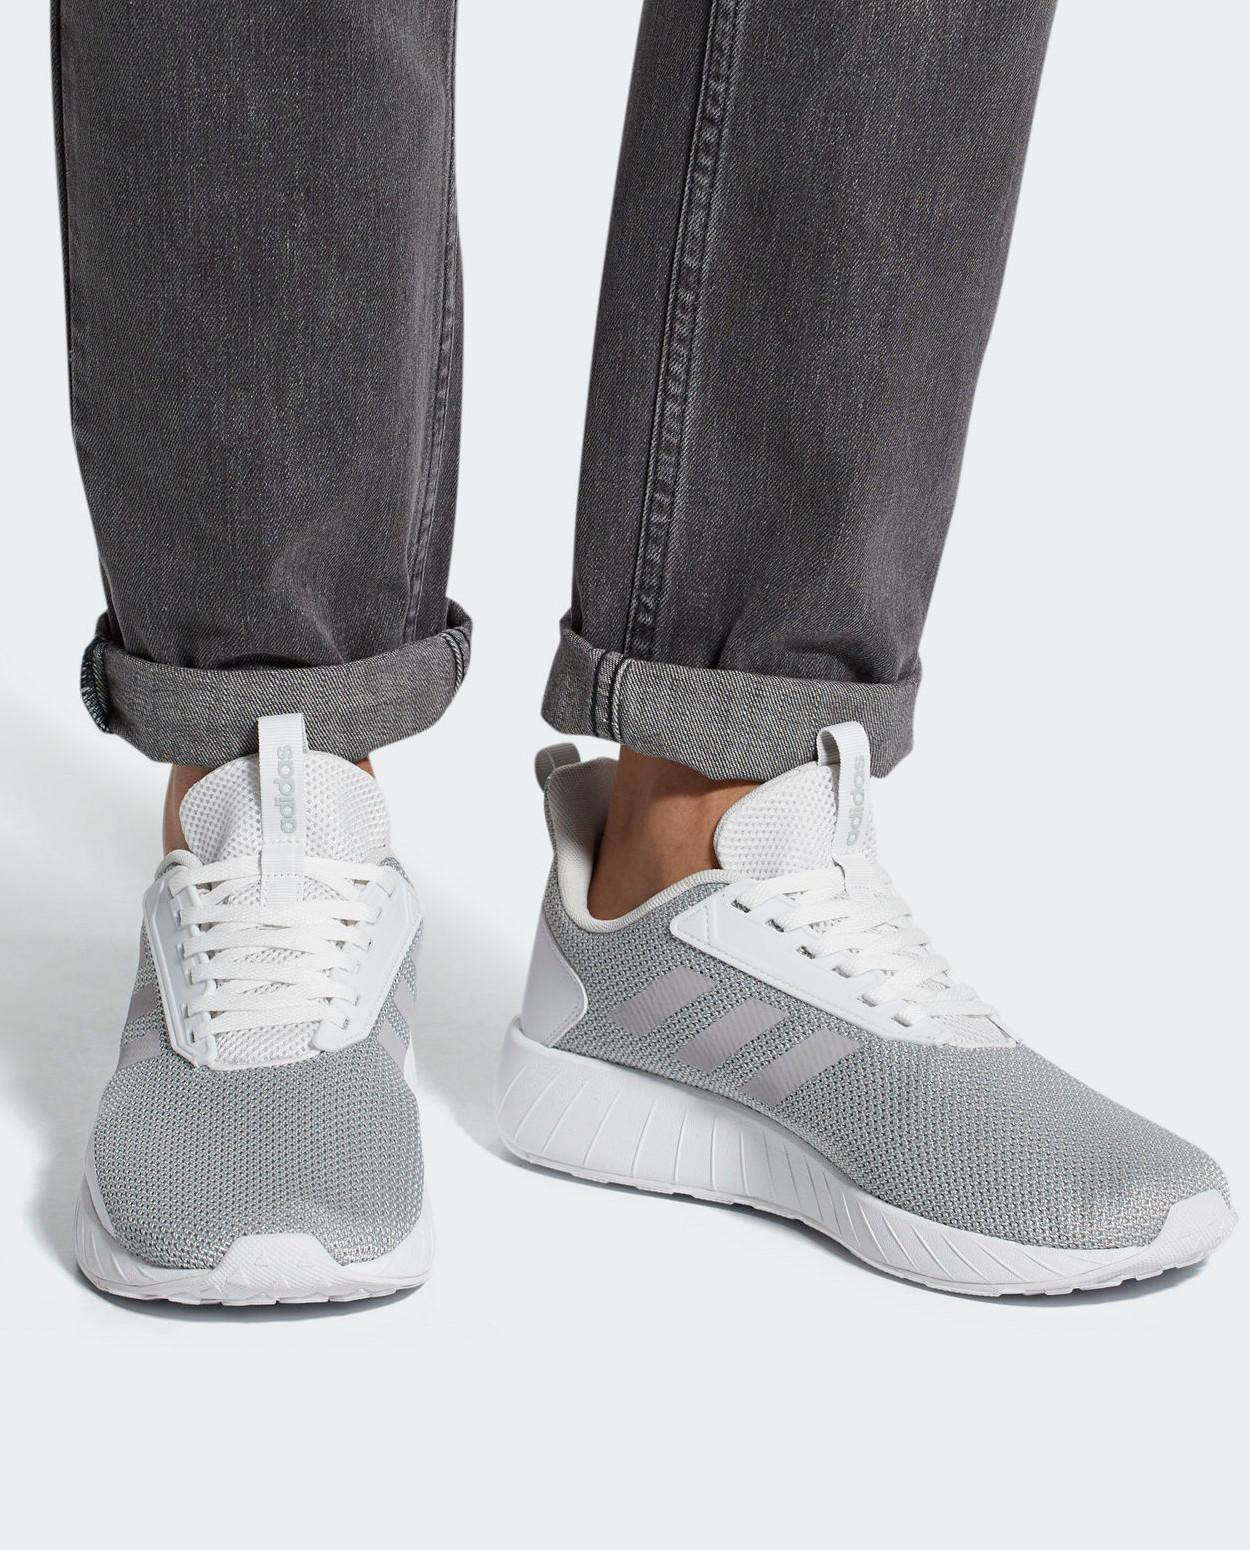 Adidas Sport Schuhe Trainers Running Shoe weiß Questar Drive Herren